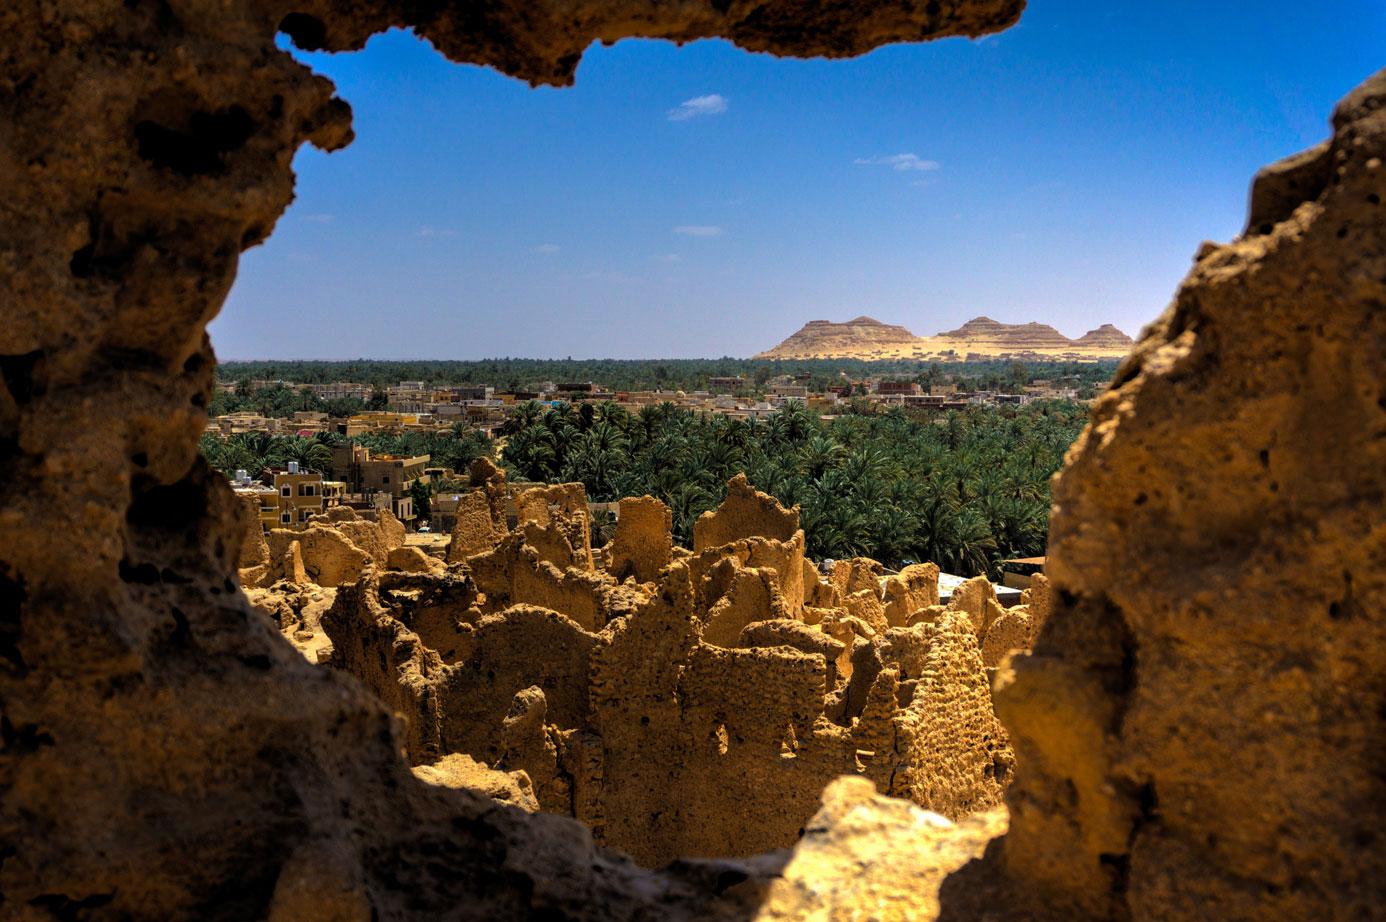 siwa, siwa egypt, siwa Oasis egypt, the oasis of siwa, deluxe tours egypt, travel to siwa, cairo to siwa, dakrour mountain, siwa dakrour mountain